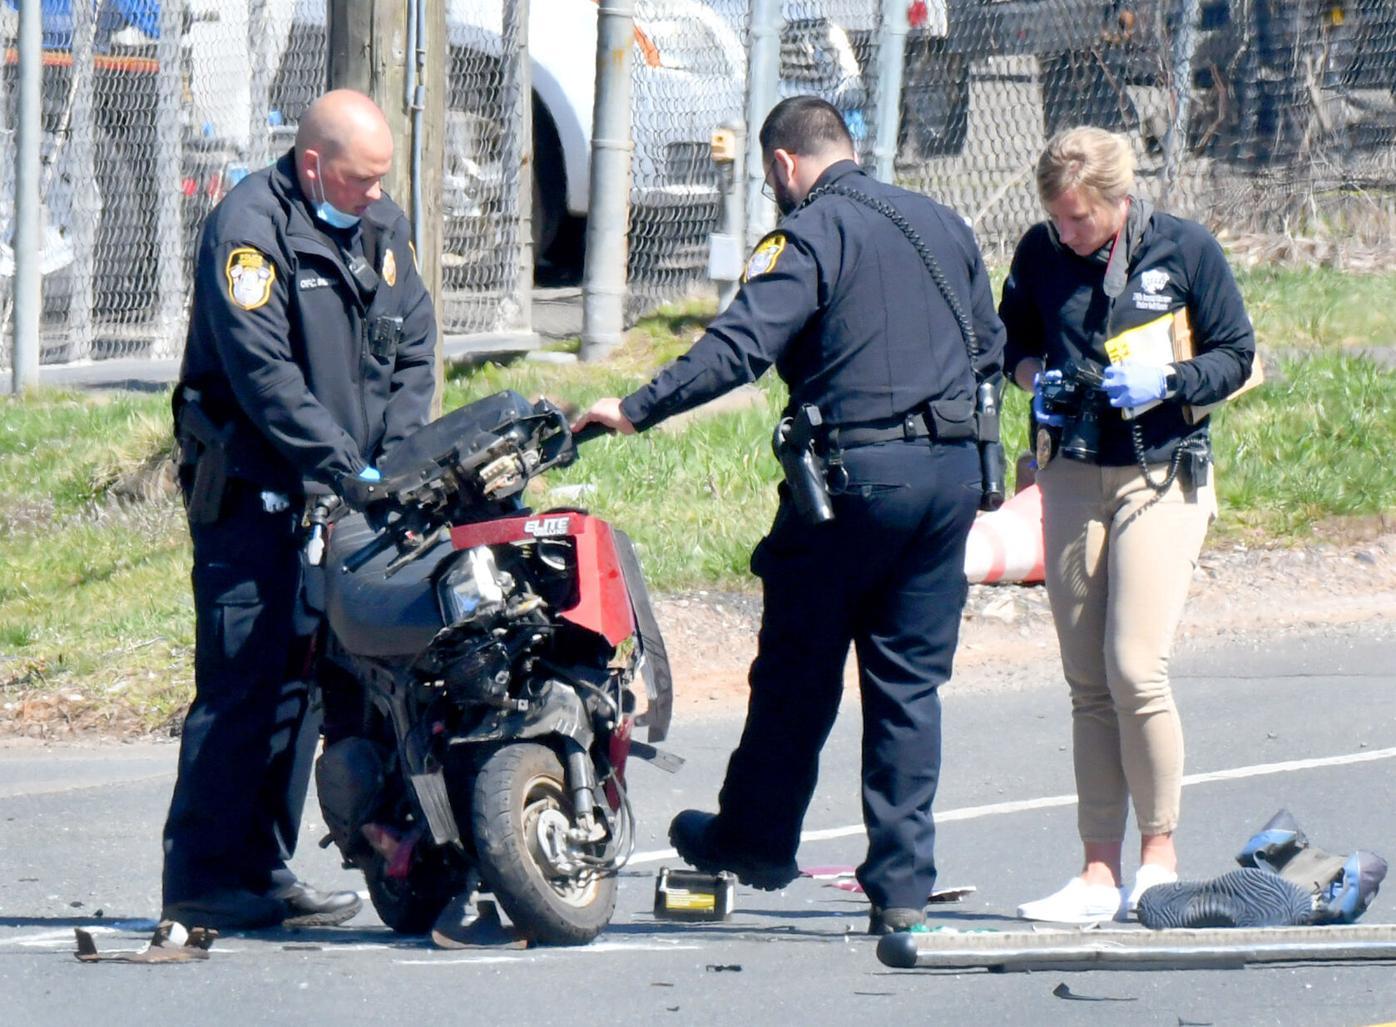 040621 EW Motorcycle Accident 02.jpg